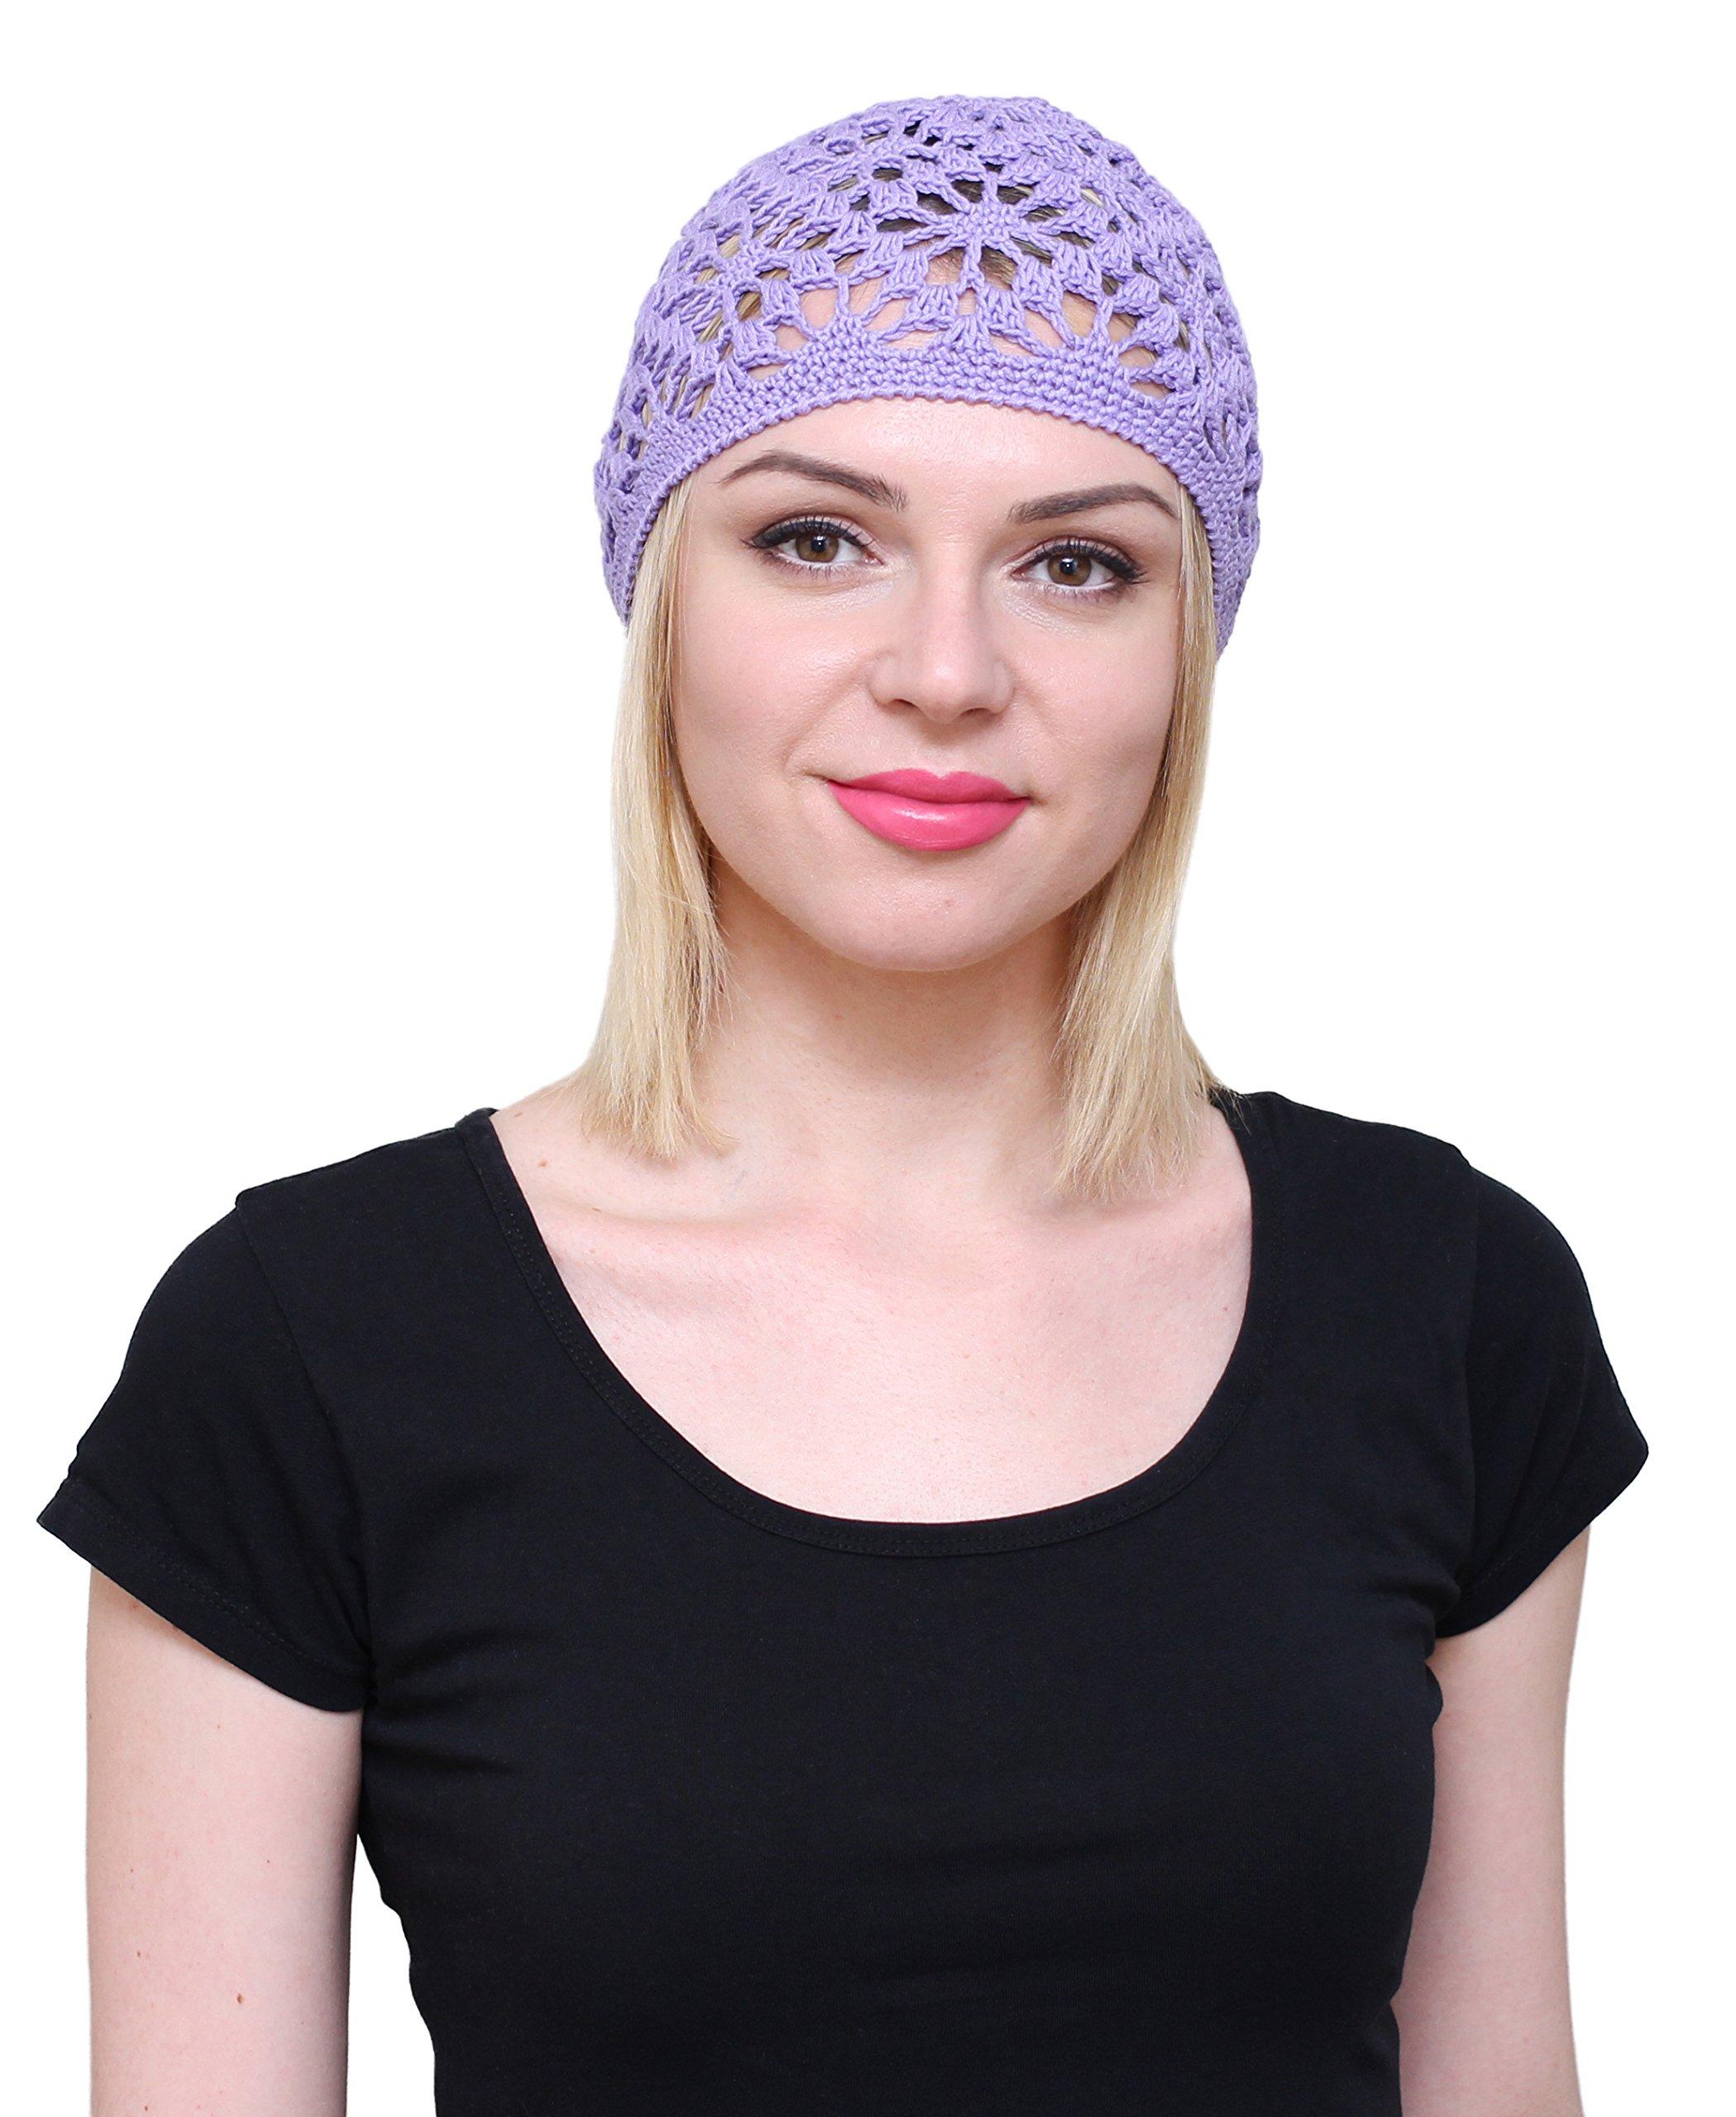 NFB Cotton Hats for Women Ladies Summer Beanie Lace Cloche Hair Accessories Cap (Violet) by NFB (Image #2)